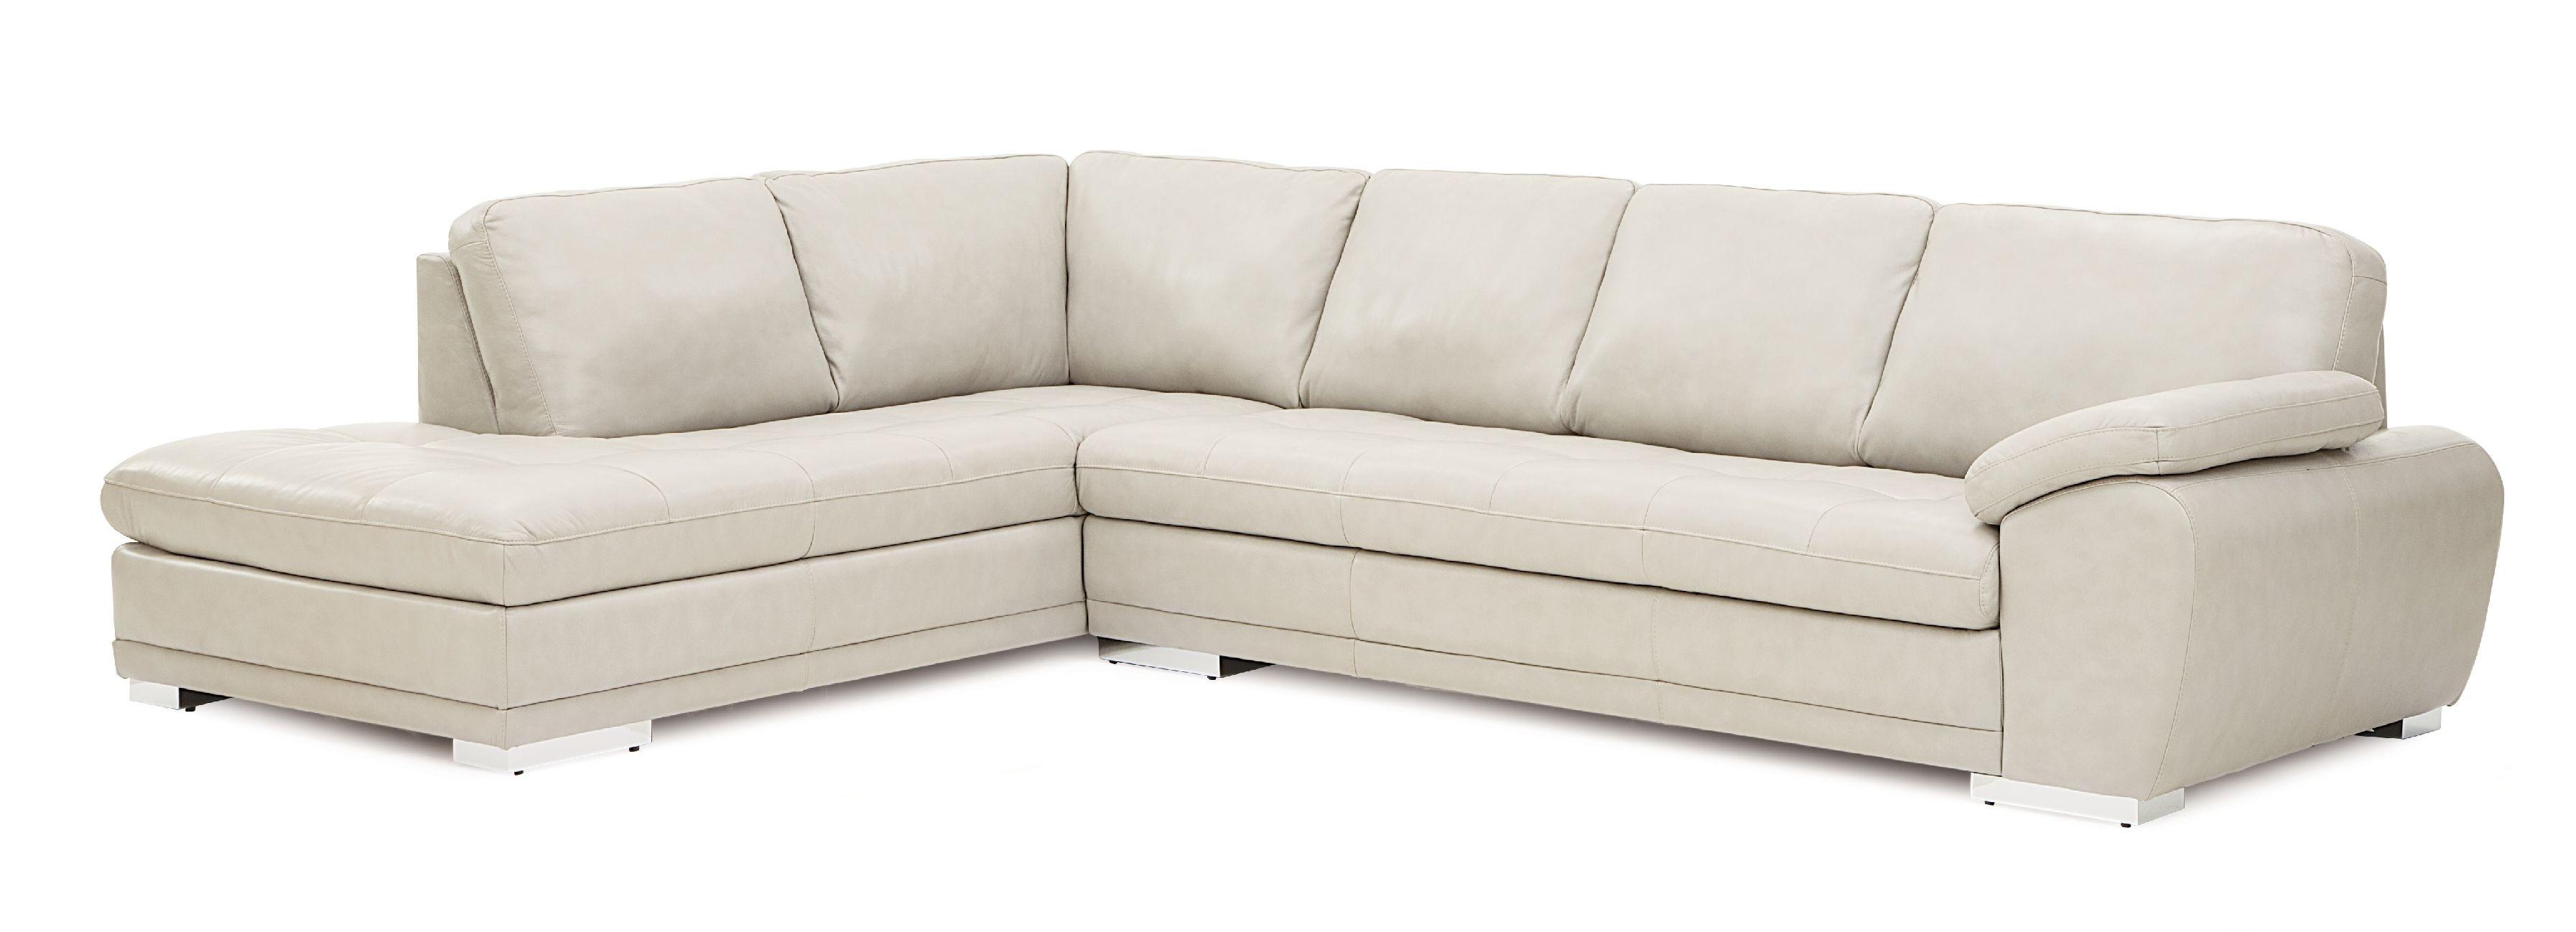 Good Palliser Furniture Miami Sectional 77319 Sectional